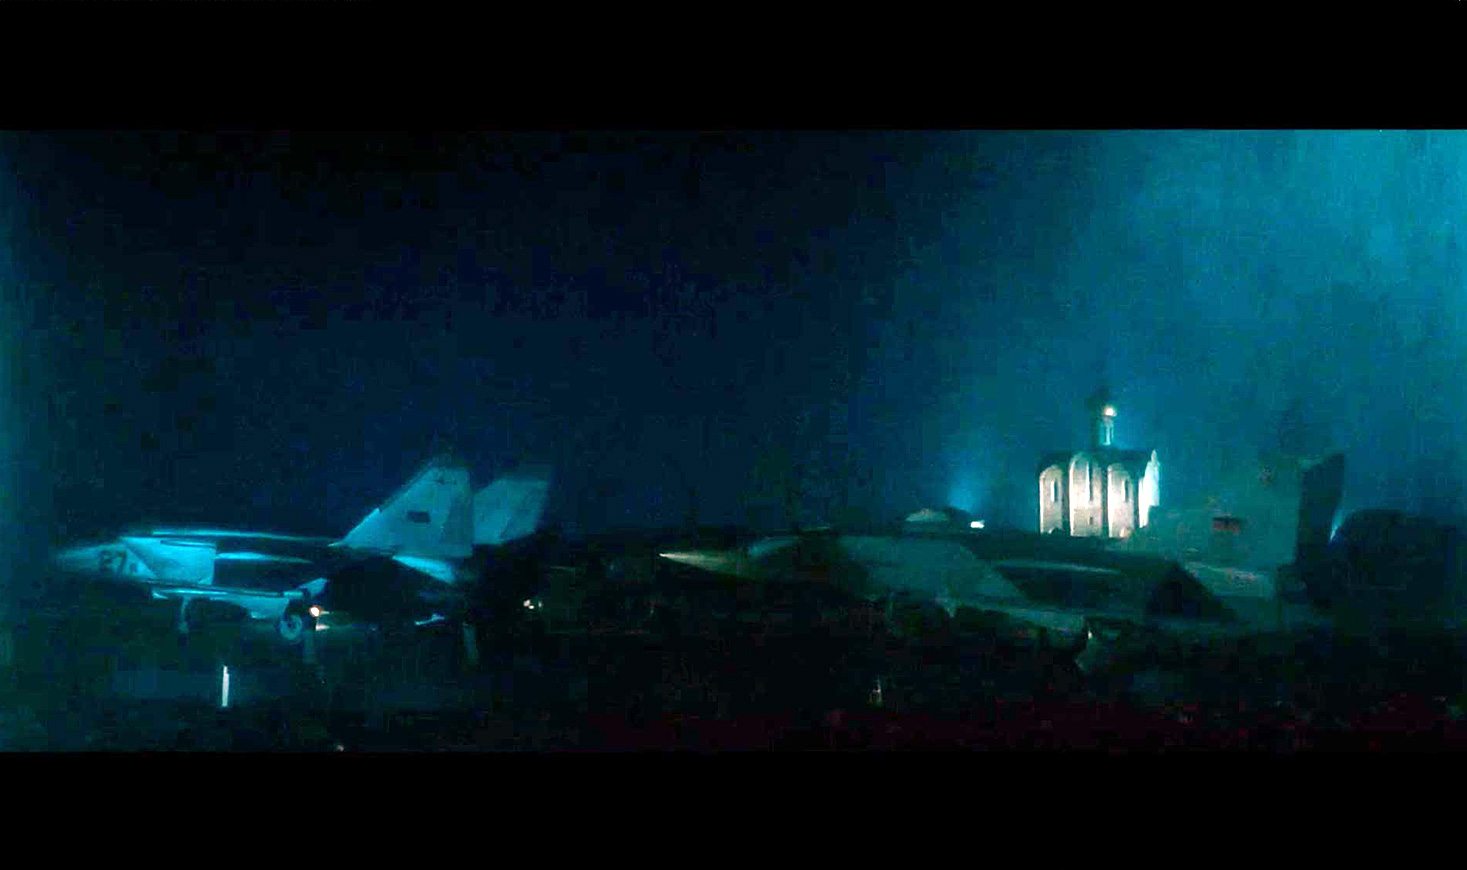 Independence Day. Sumber: Cuplikan layar dari film